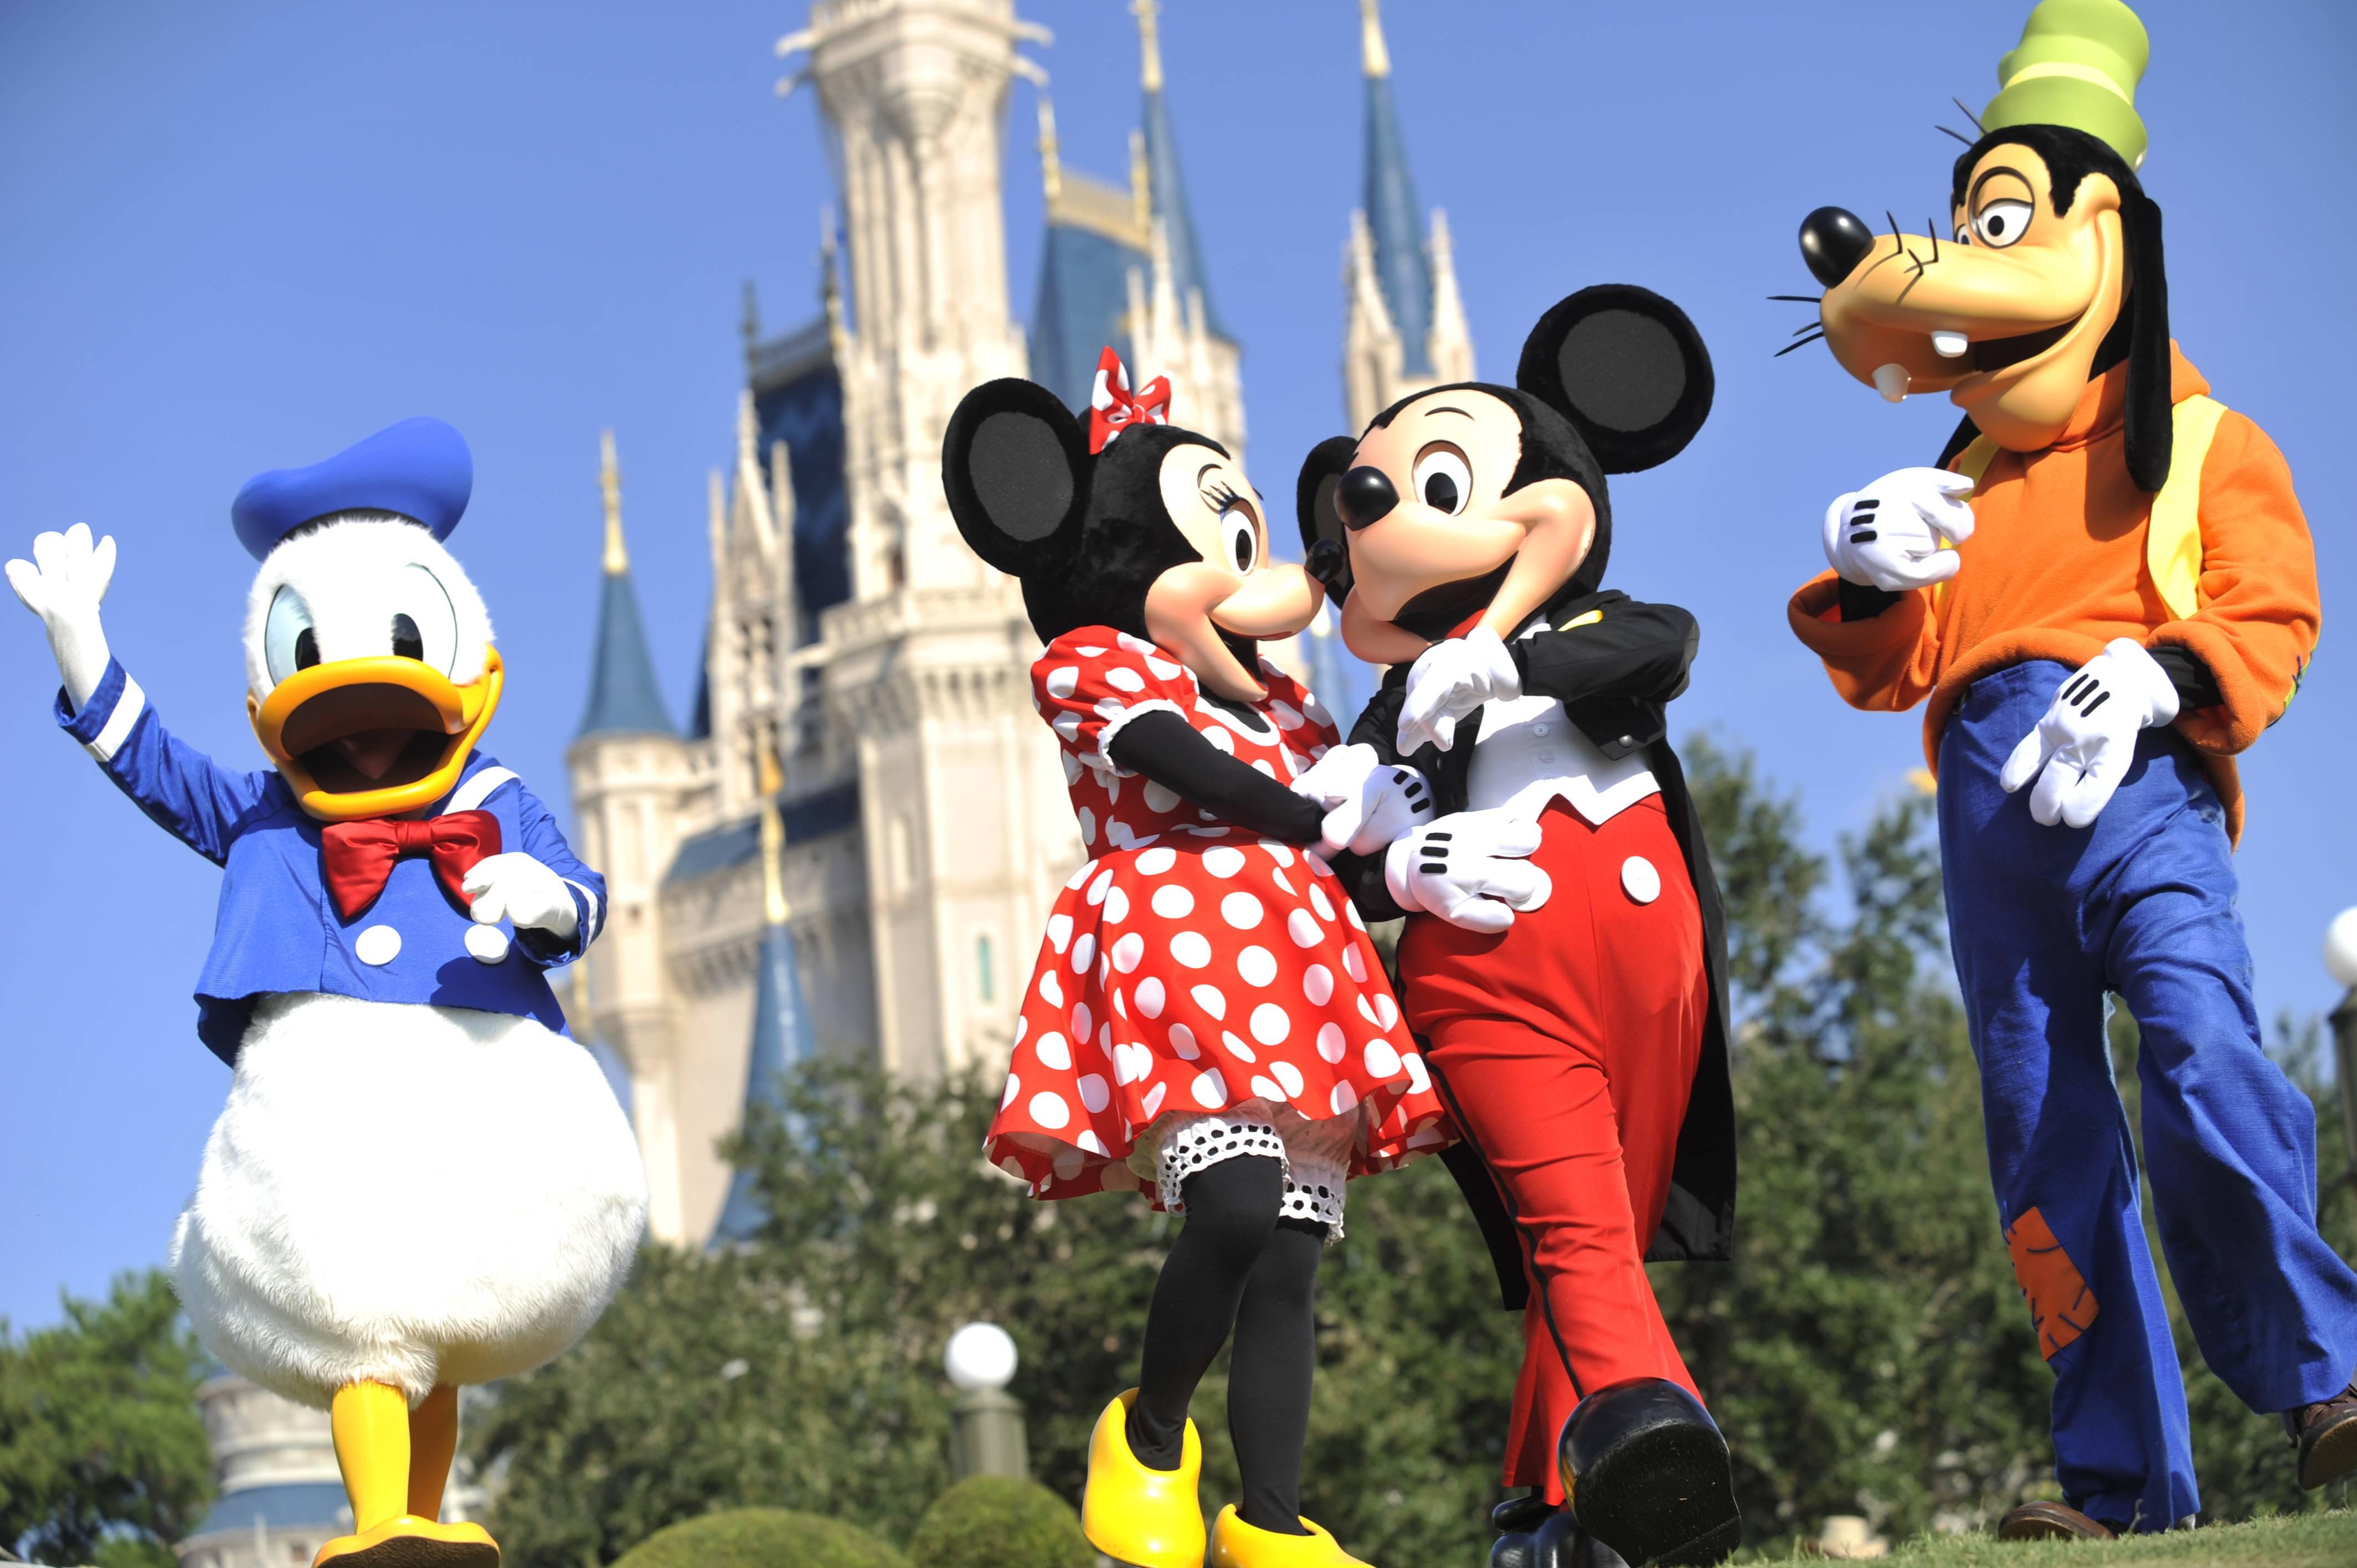 1-Day Ticket for Disneyland or California Adventure Park